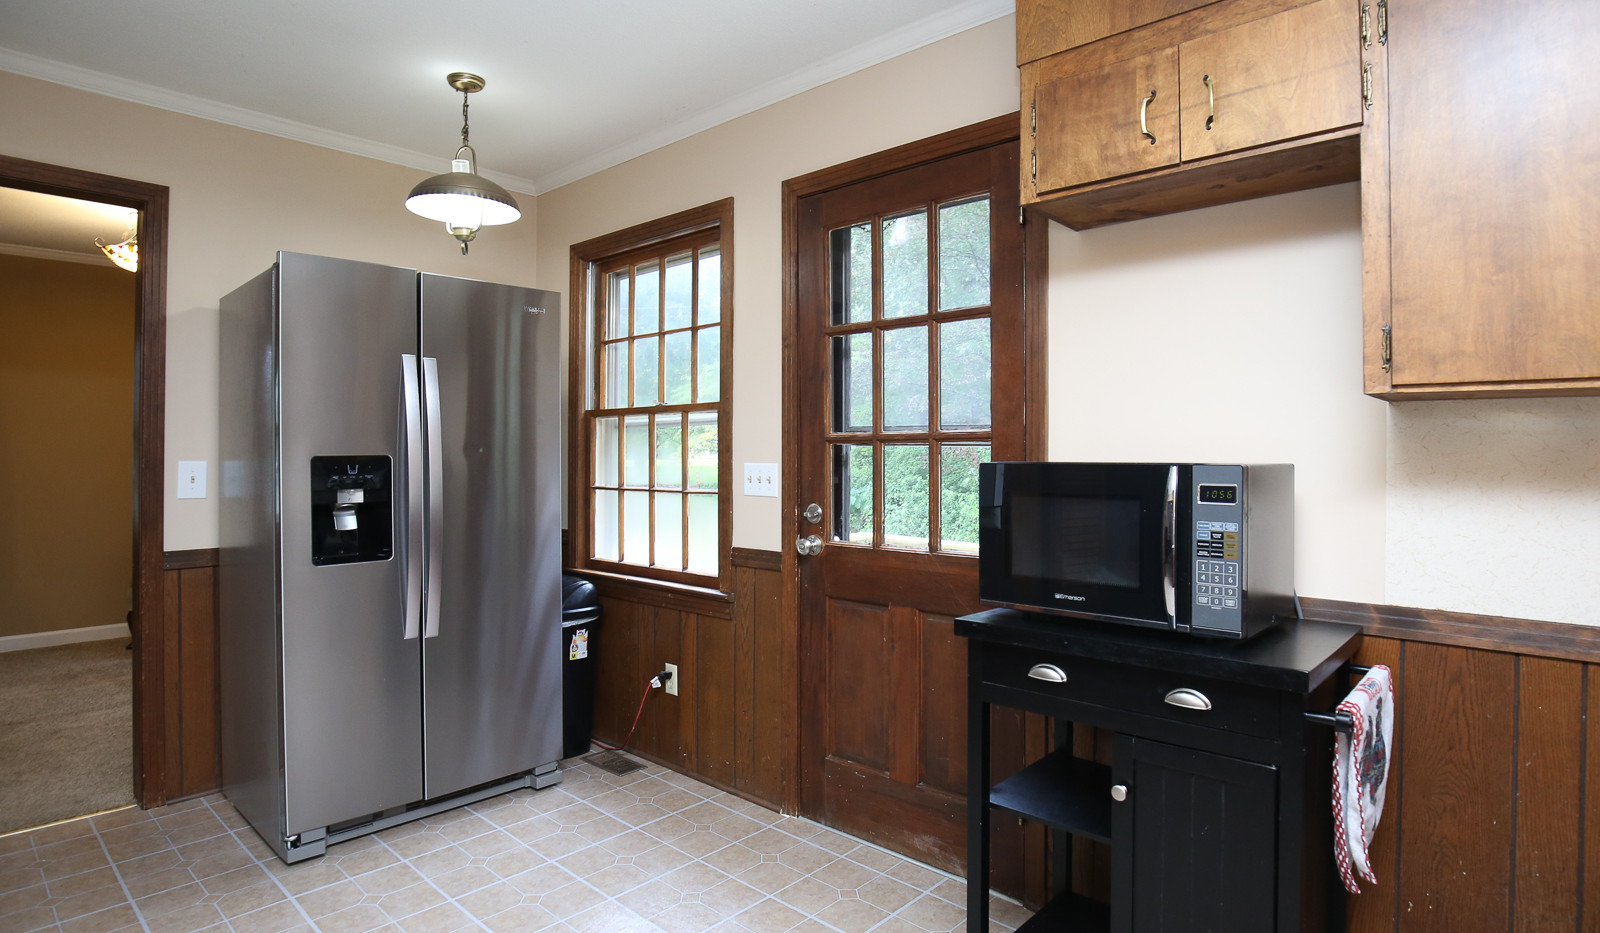 014_294_barnes_ave_kitchen.jpg